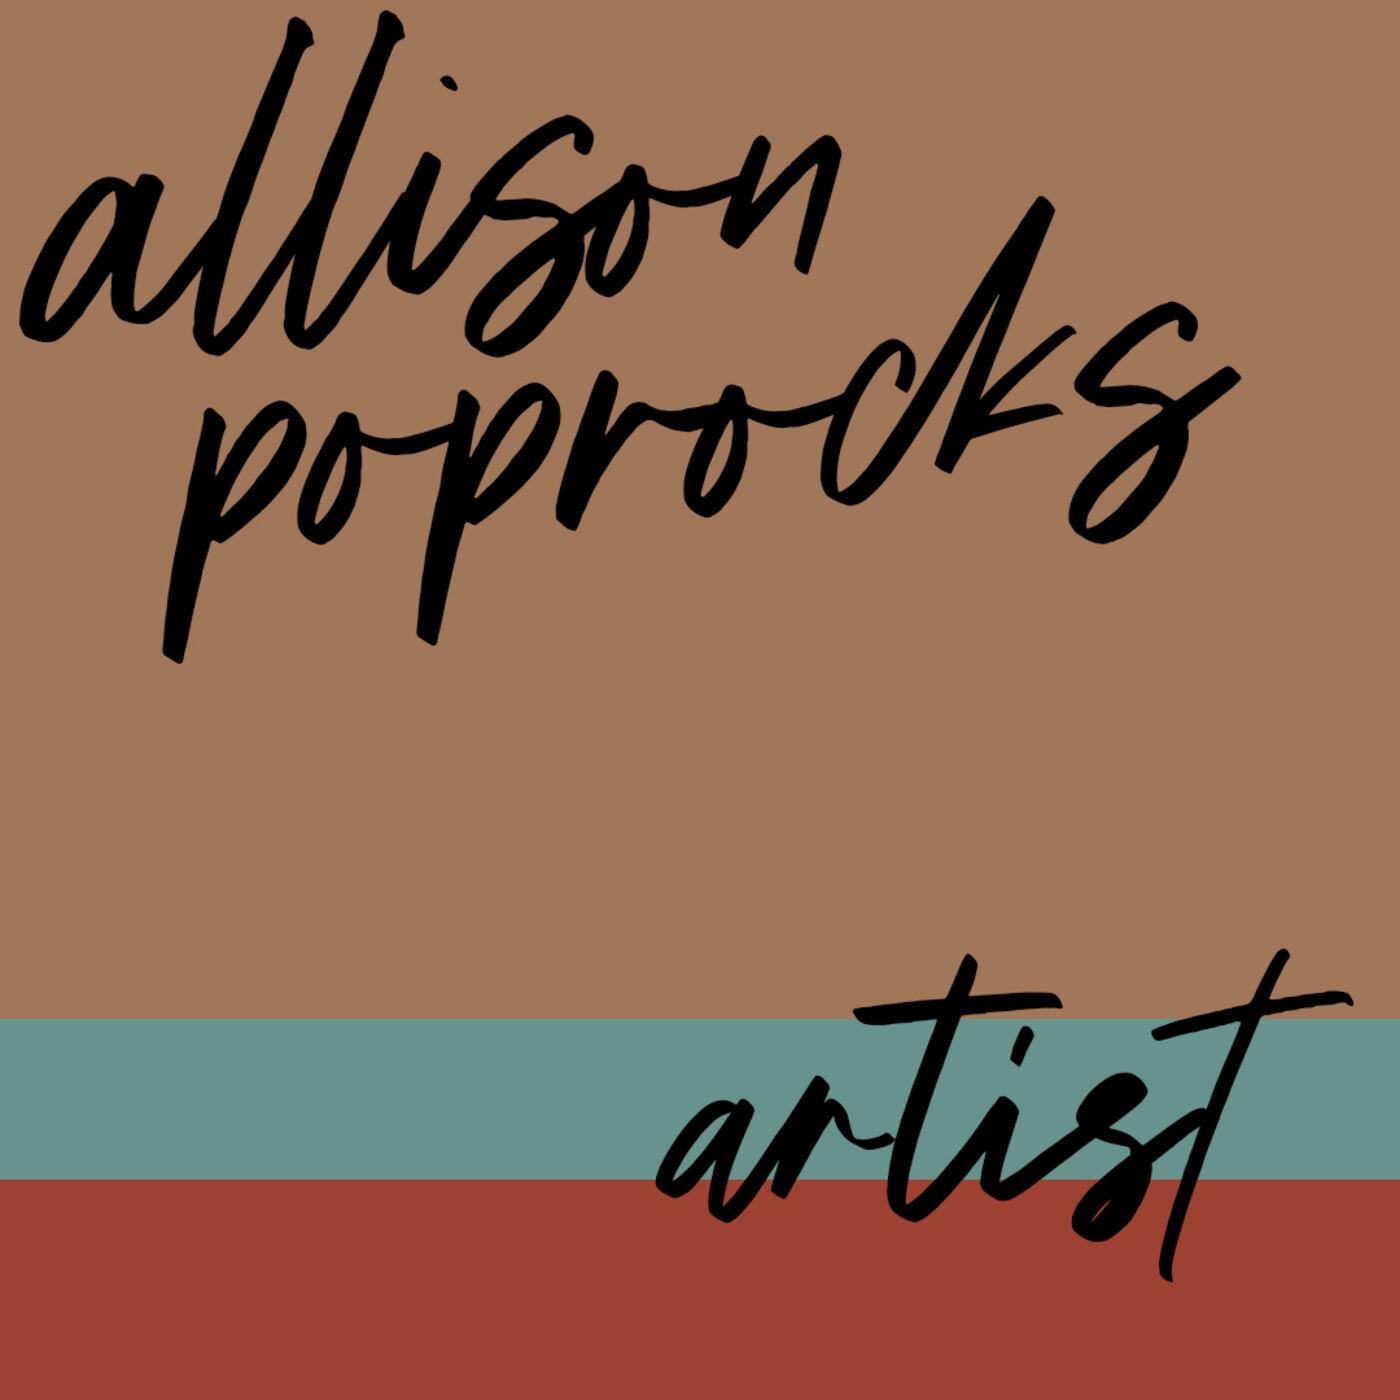 #79: Artist: Allison Poprocks: Get Out to Nature